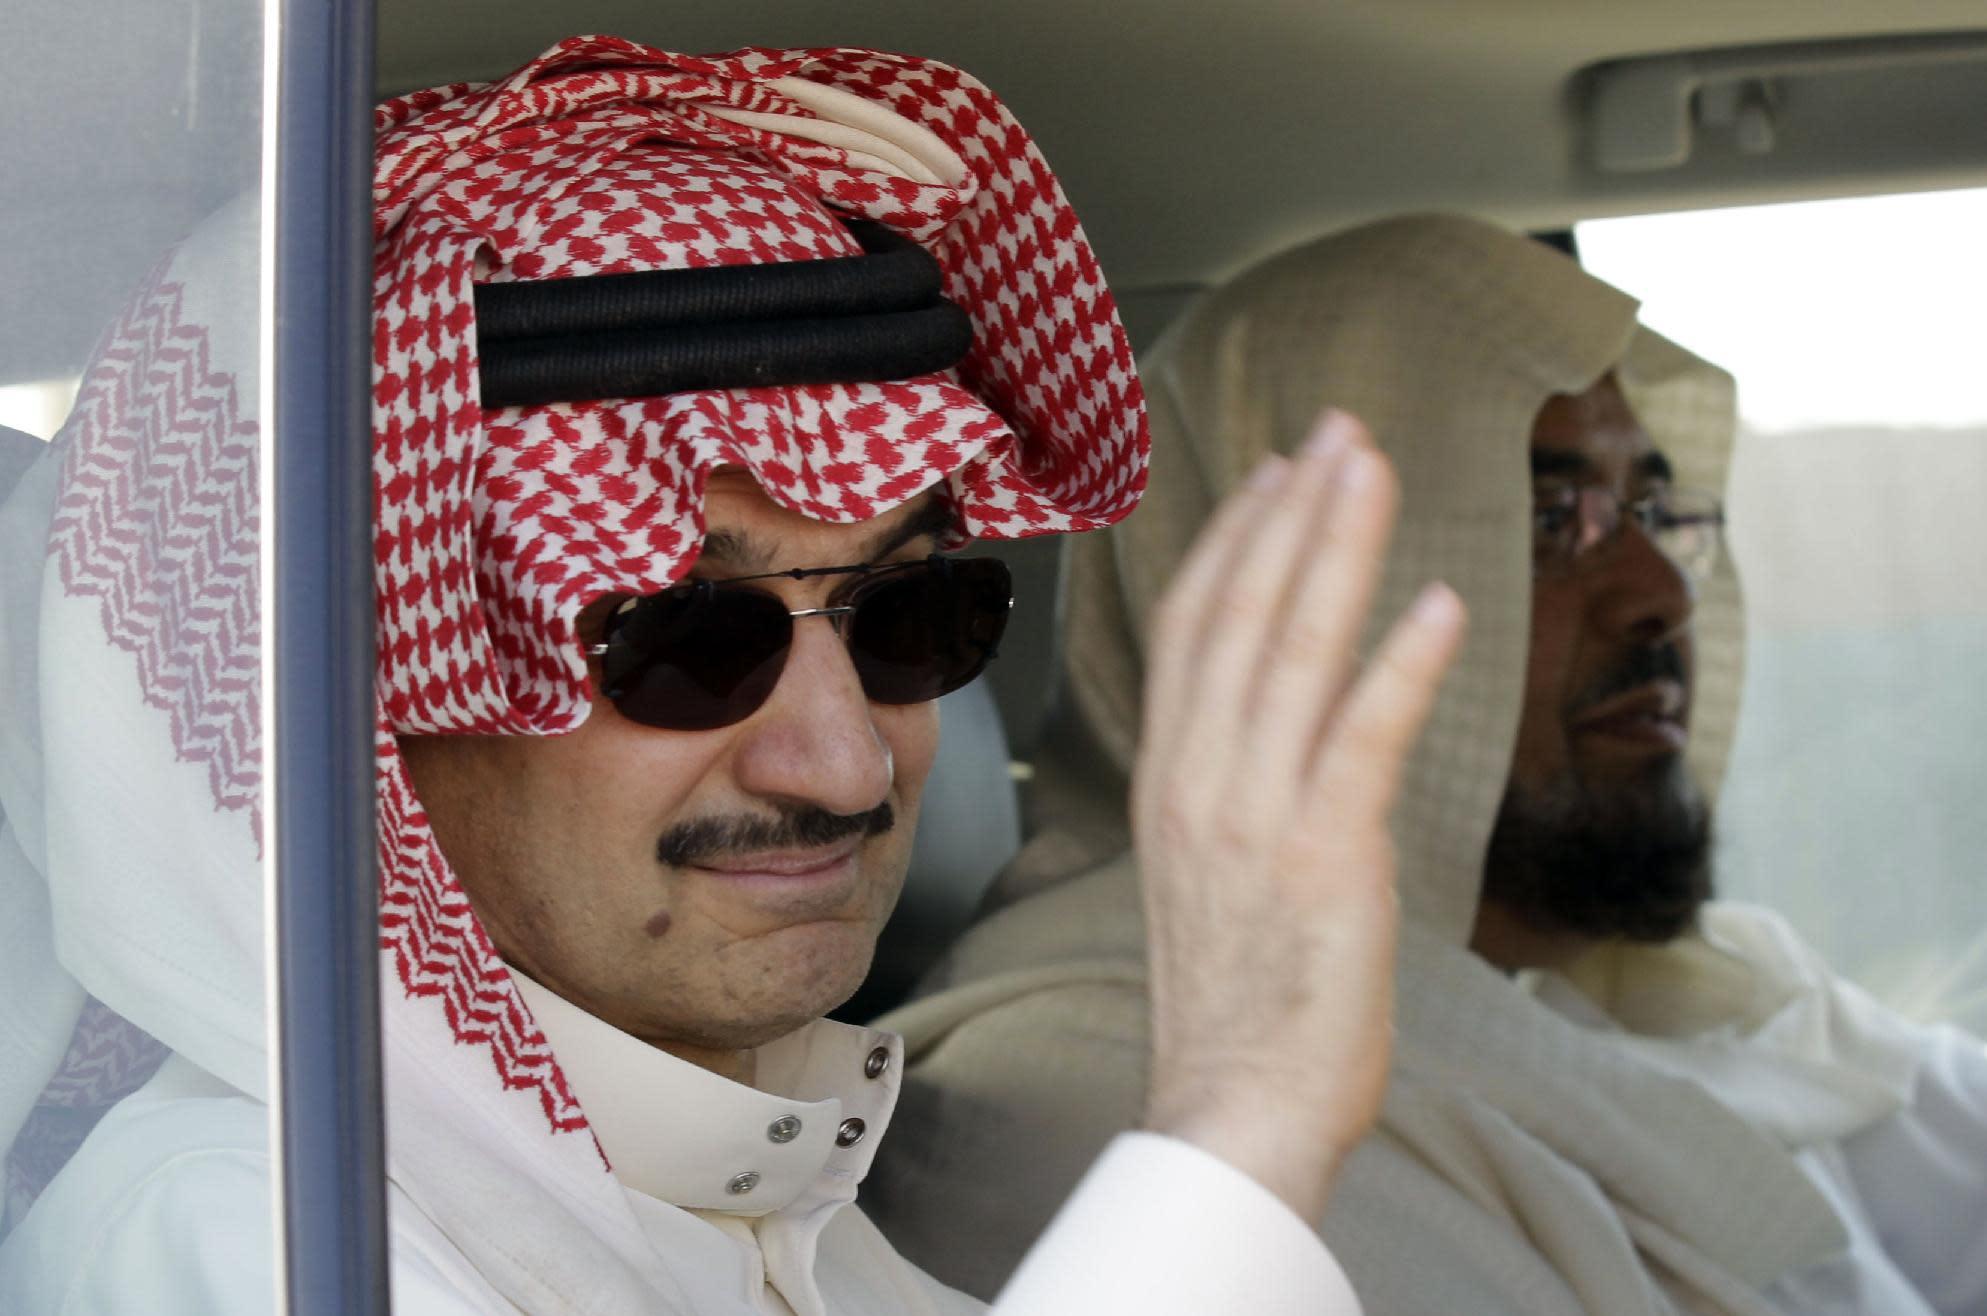 Saudi billionaire prince to launch Arab news channel